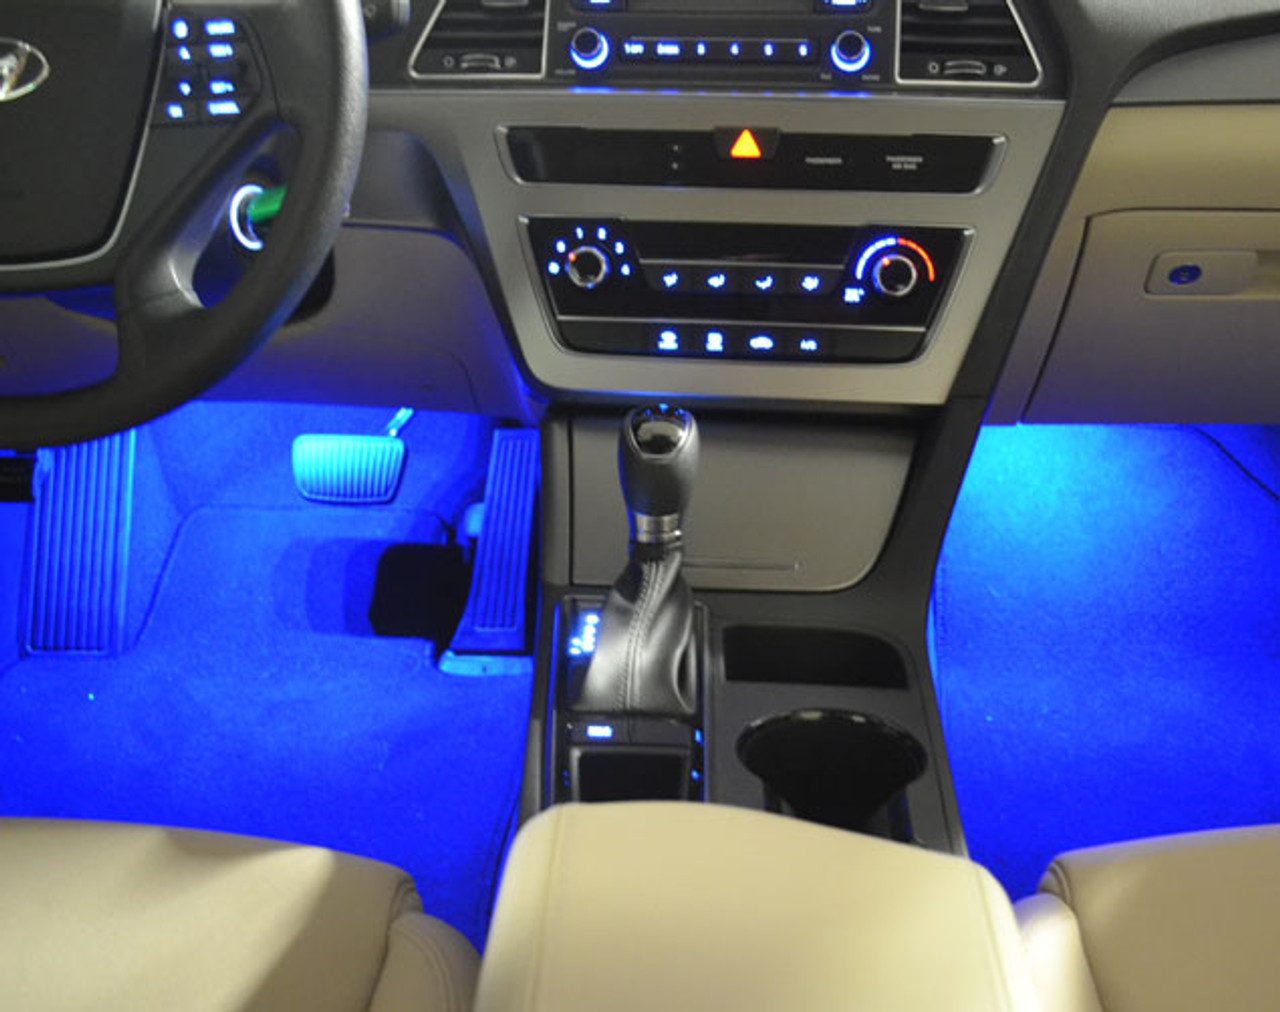 Hyundai sonata led interior lighting kit hyundai shop - Hyundai veloster interior accessories ...